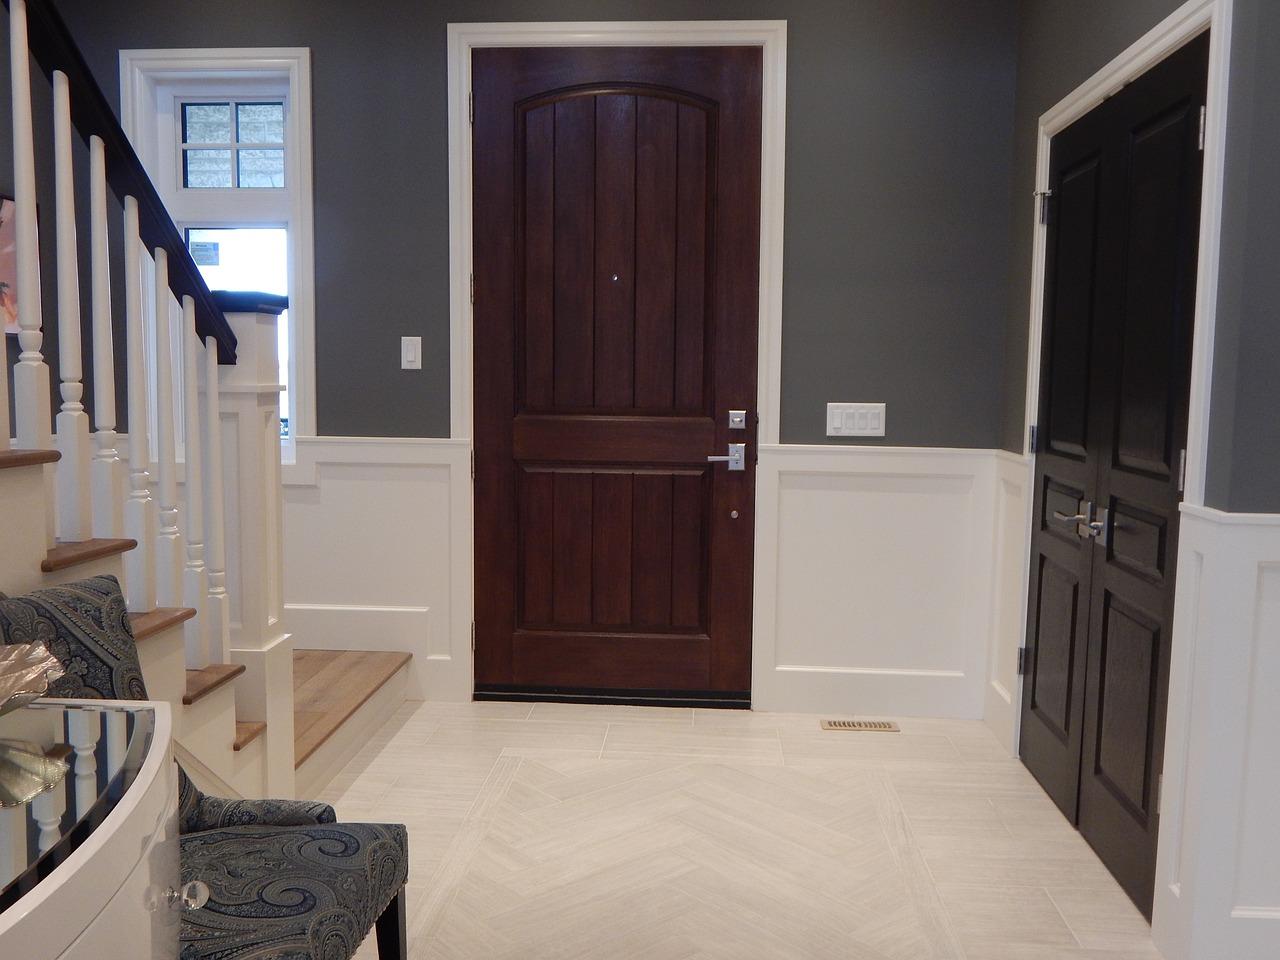 foyer-902404_1280